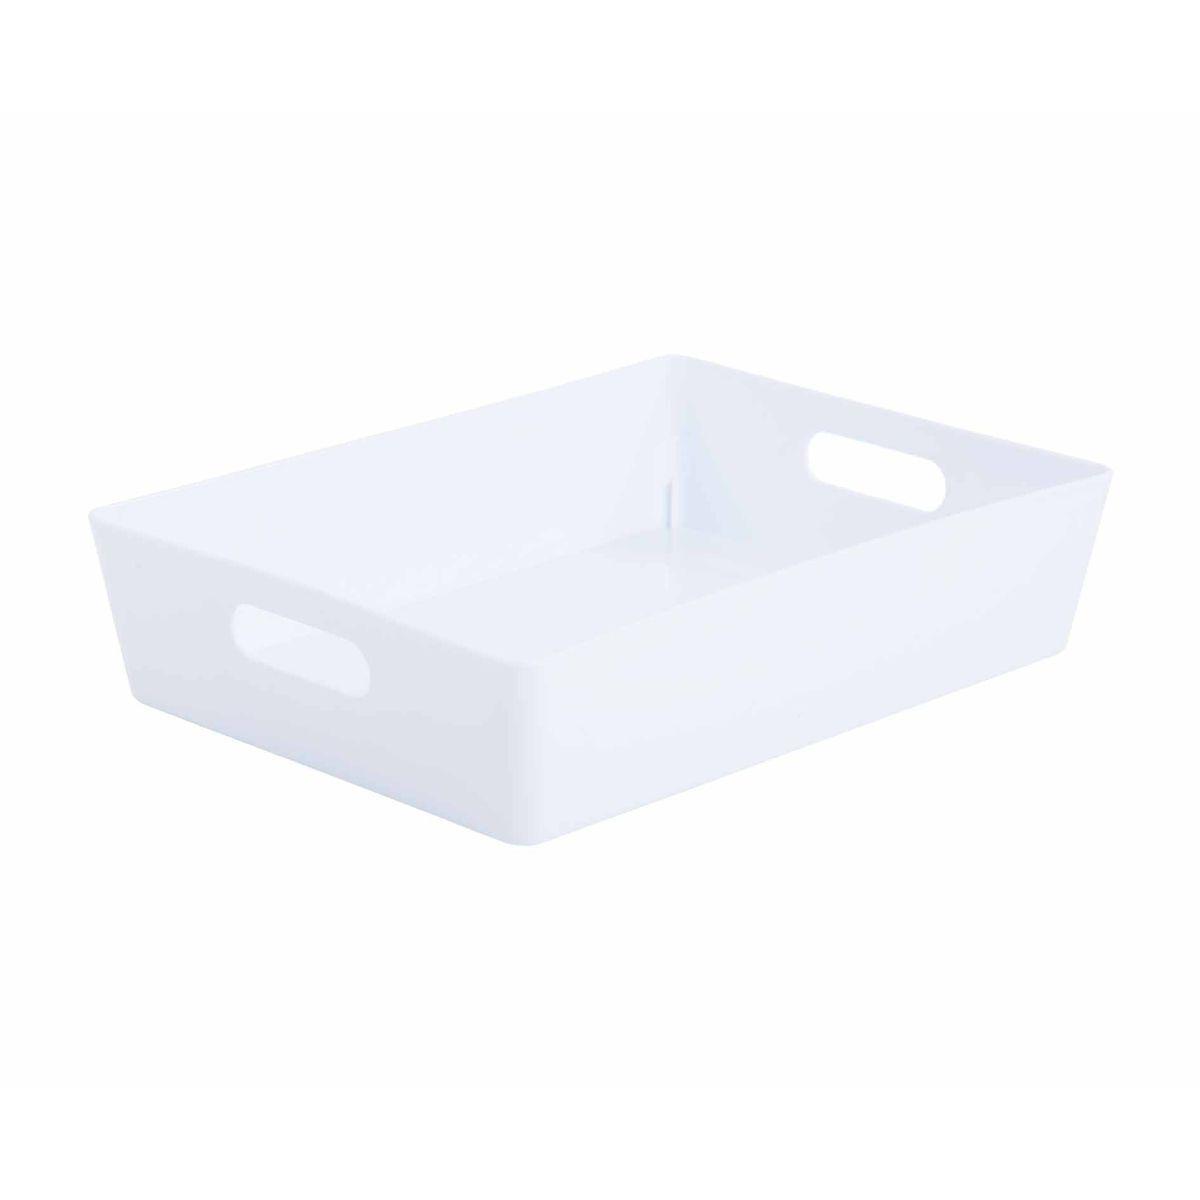 Wham Studio Basket 5.01 Pack of 12 White